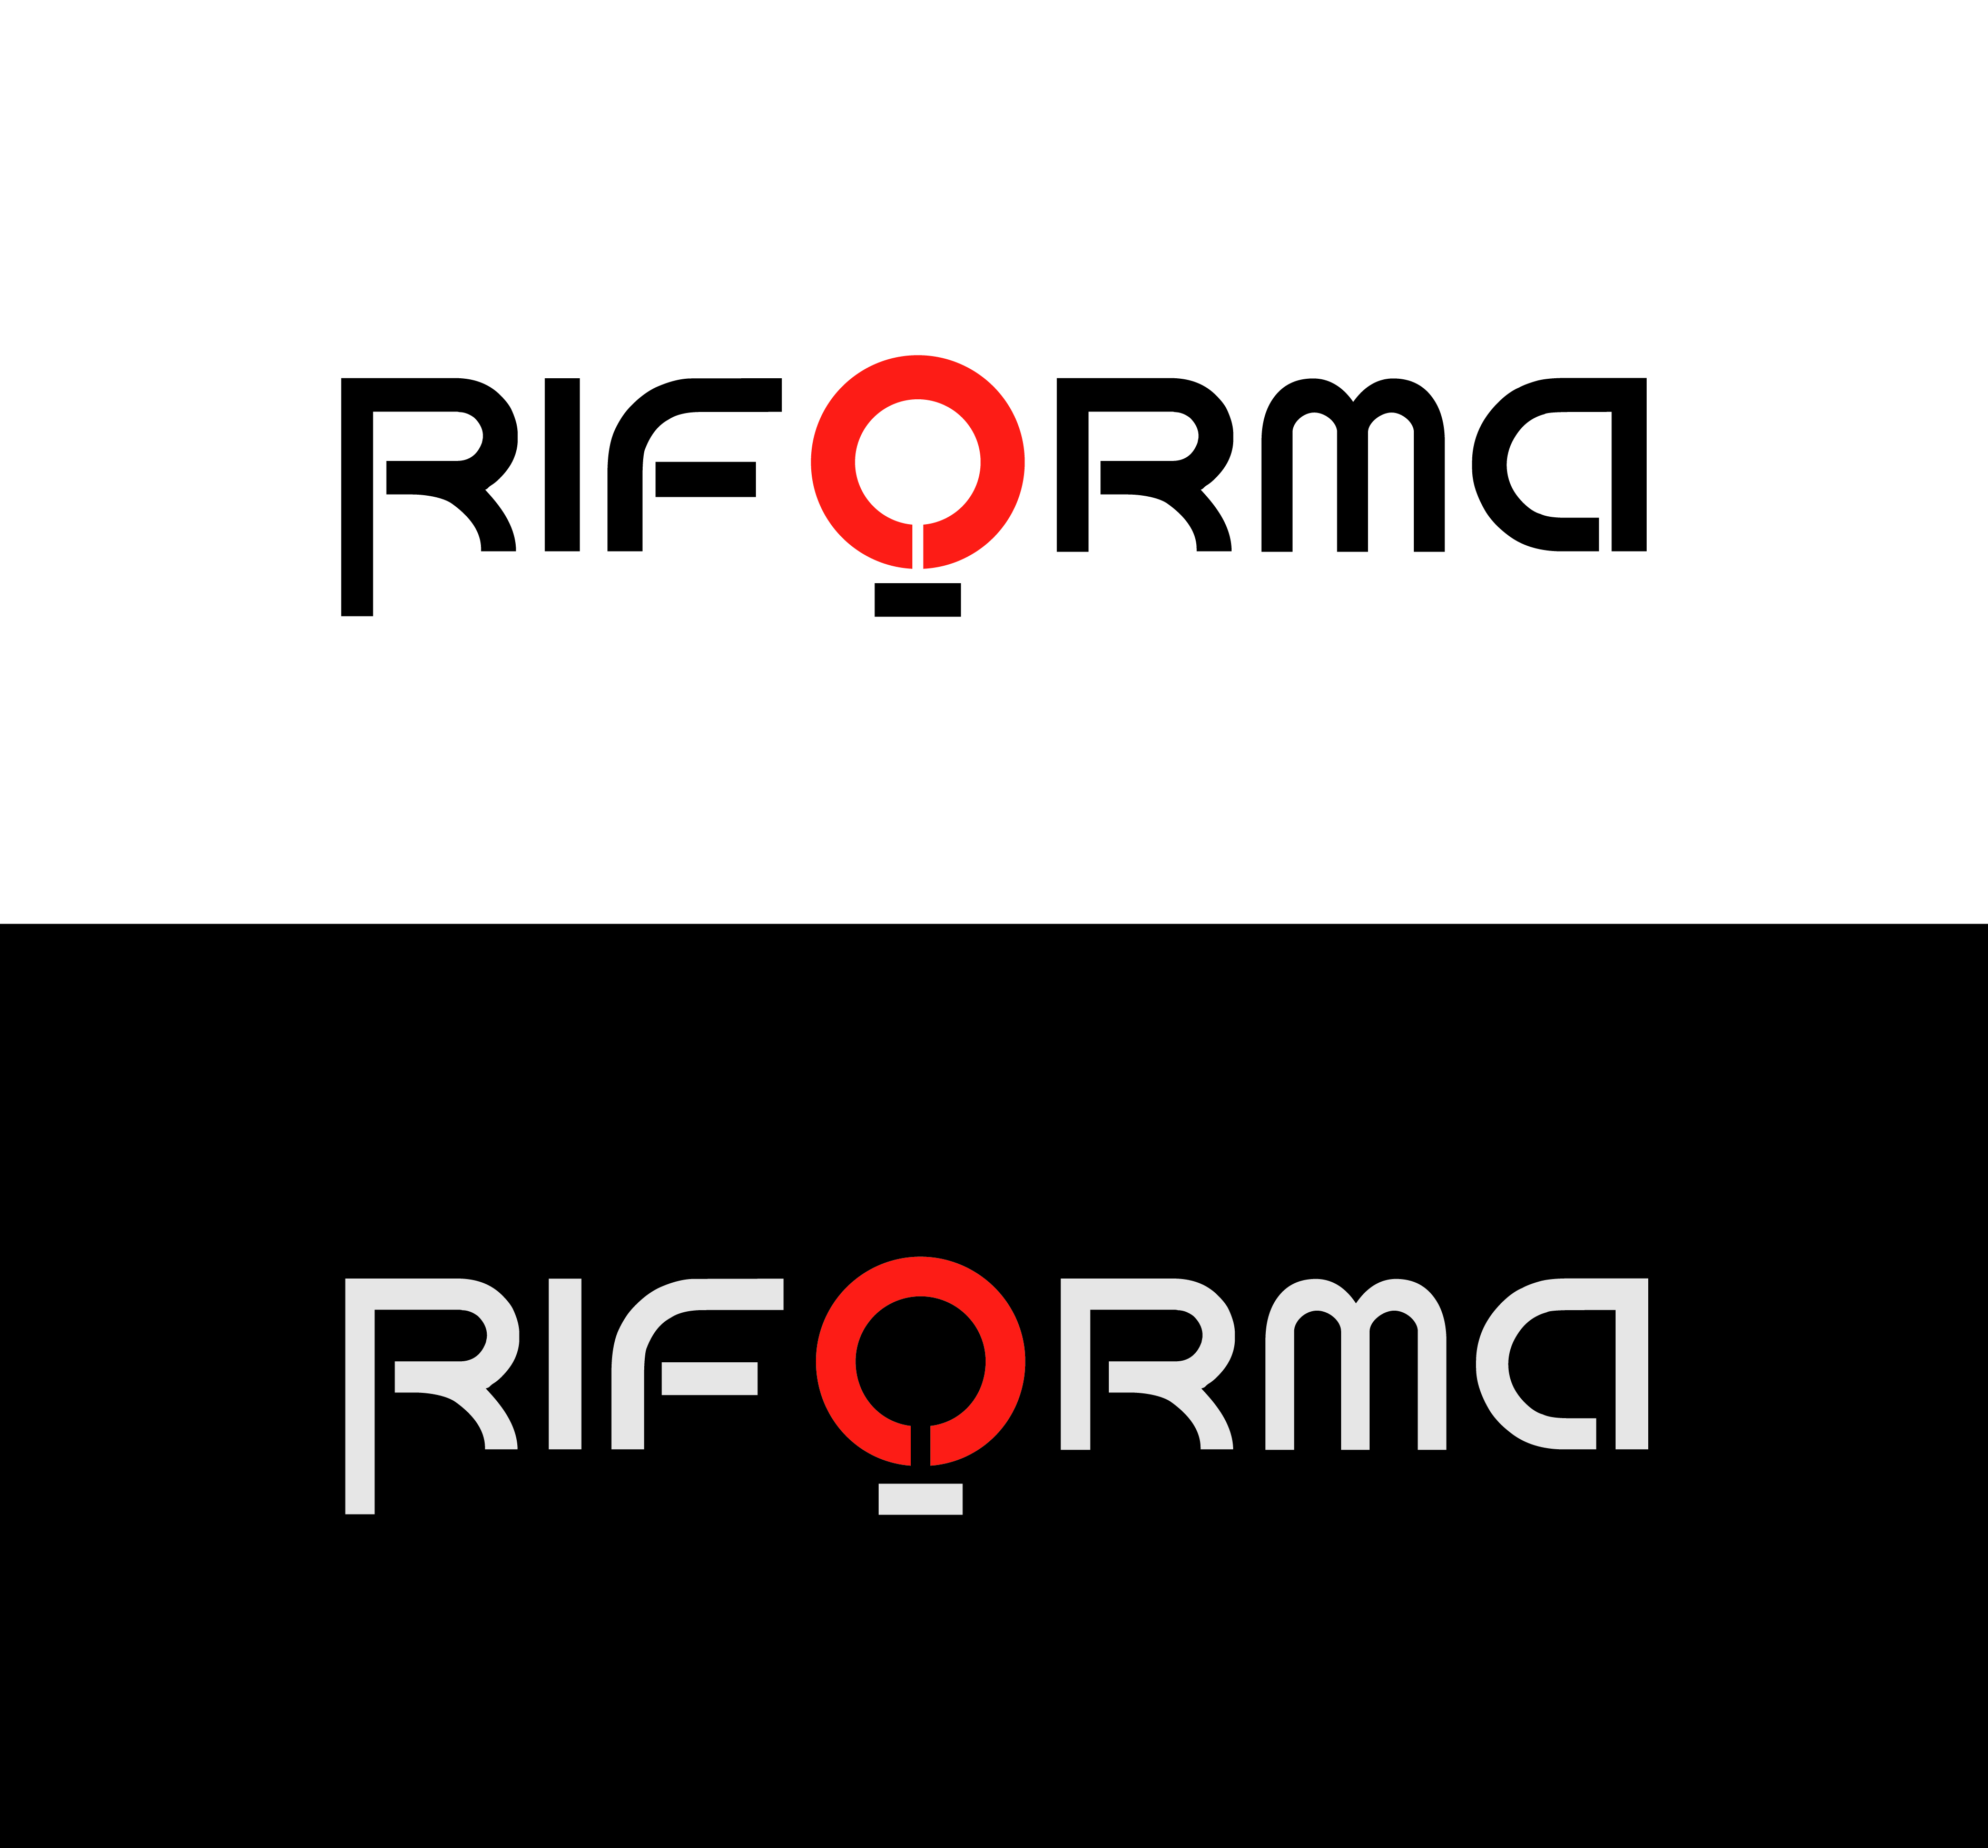 Разработка логотипа и элементов фирменного стиля фото f_06657ab1d33c6201.jpg